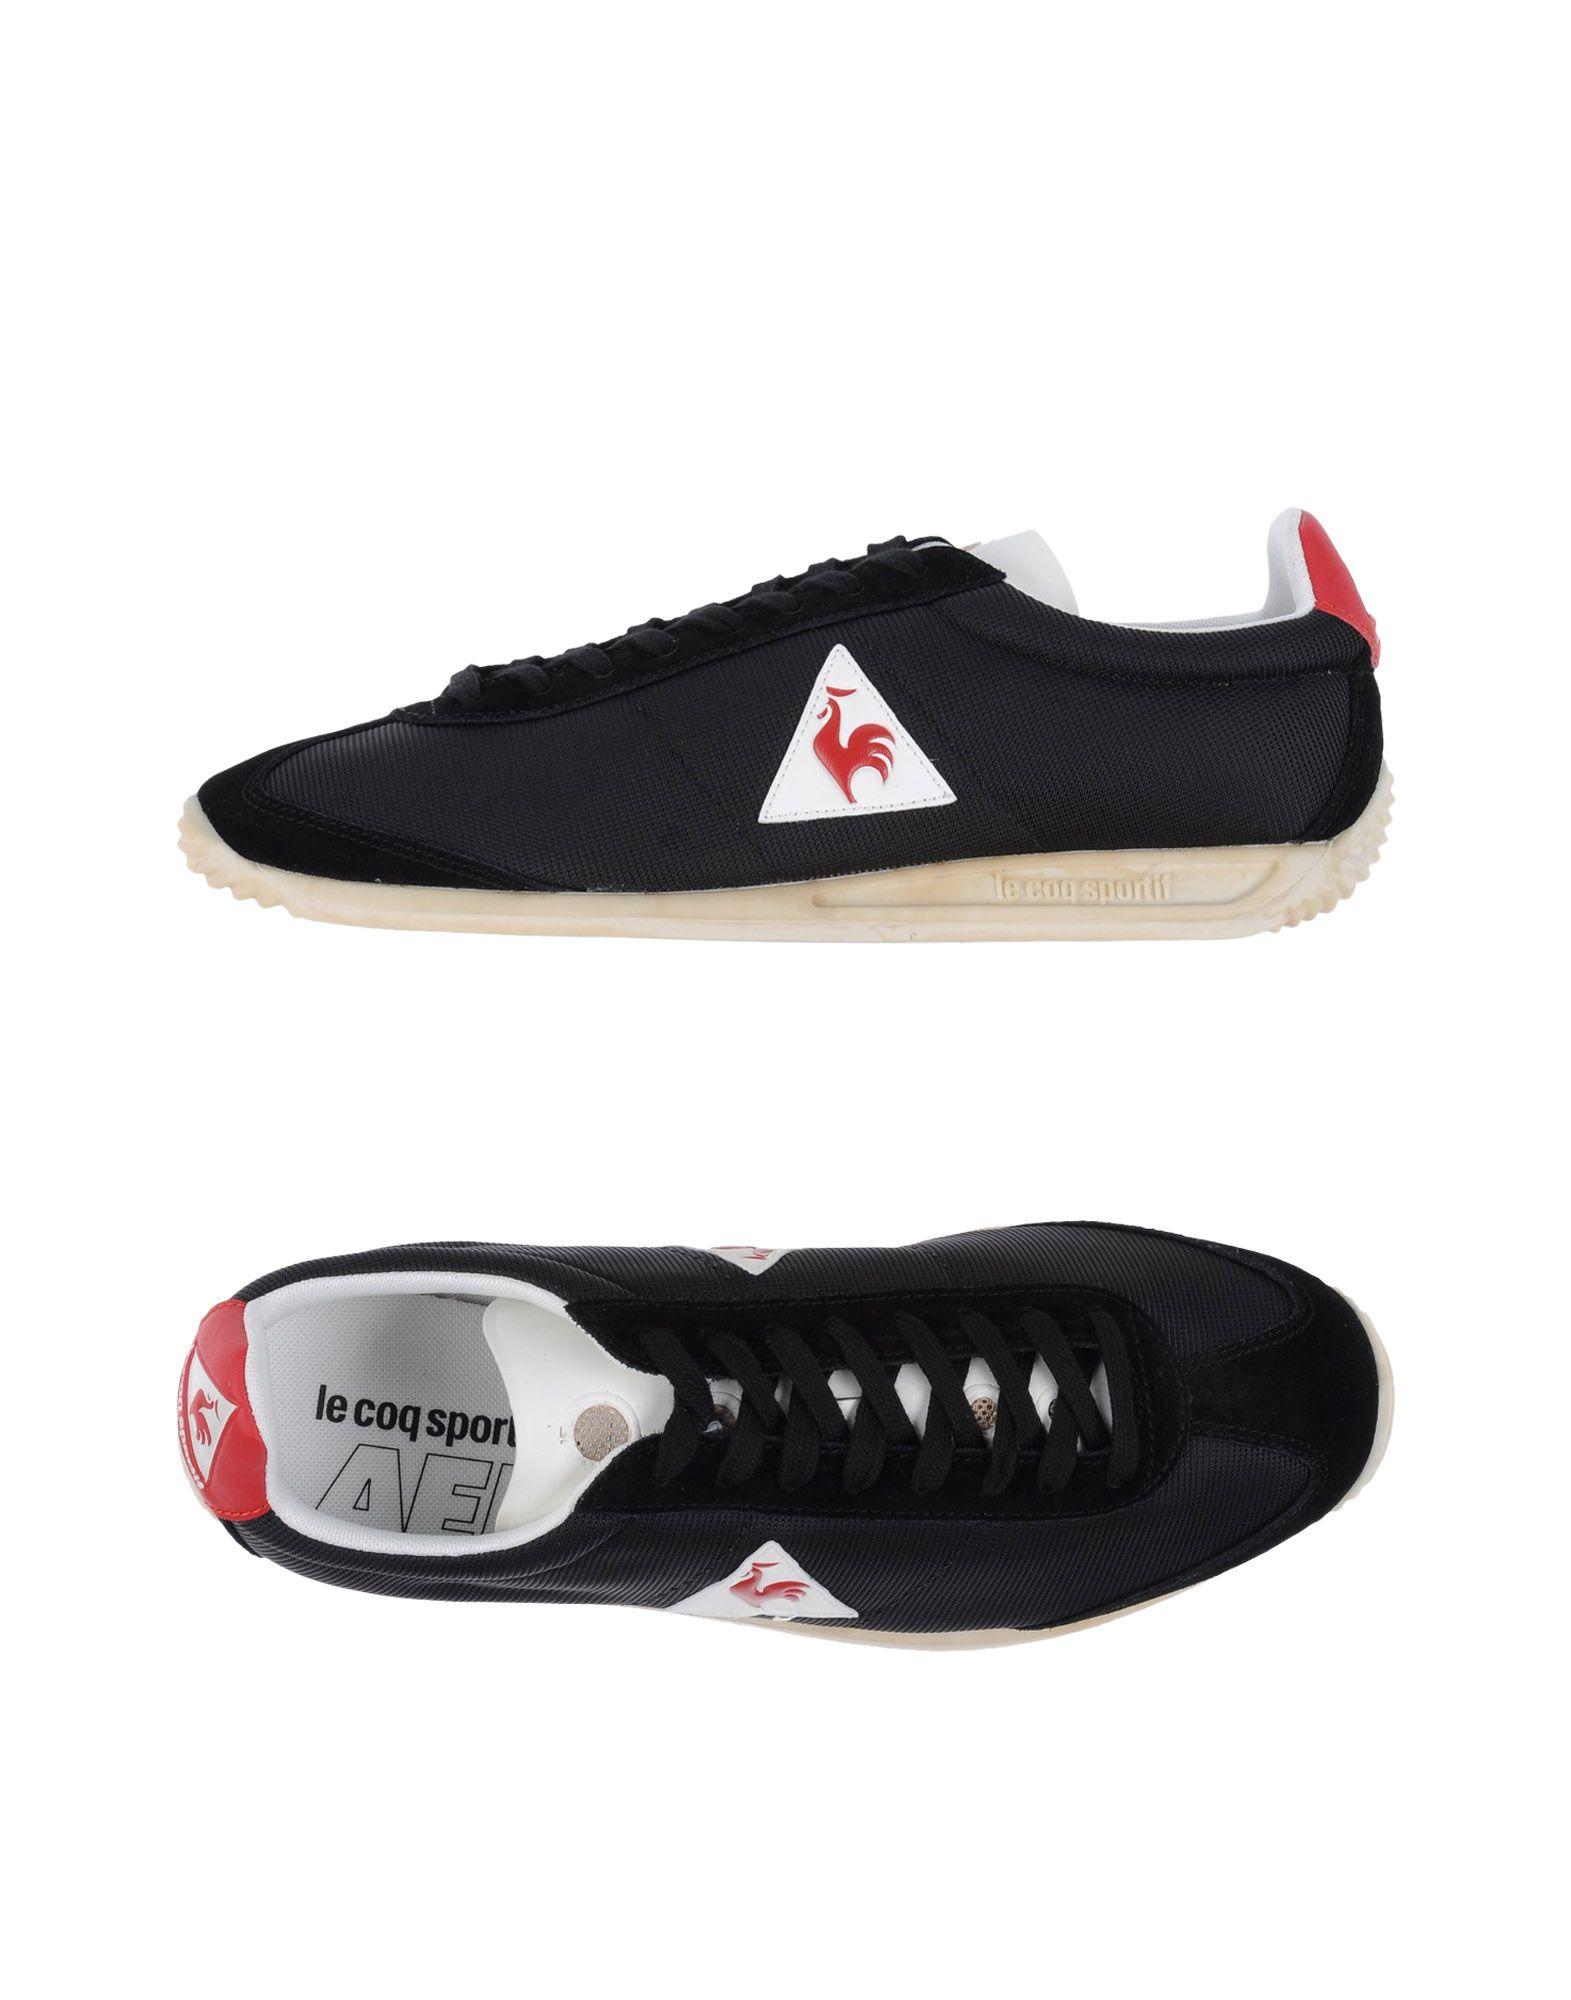 Le Coq Sportif  Quartz Vintage Aerotop - - - Sneakers - Men Le Coq Sportif Sneakers online on  Canada - 11193733LV 66dfef